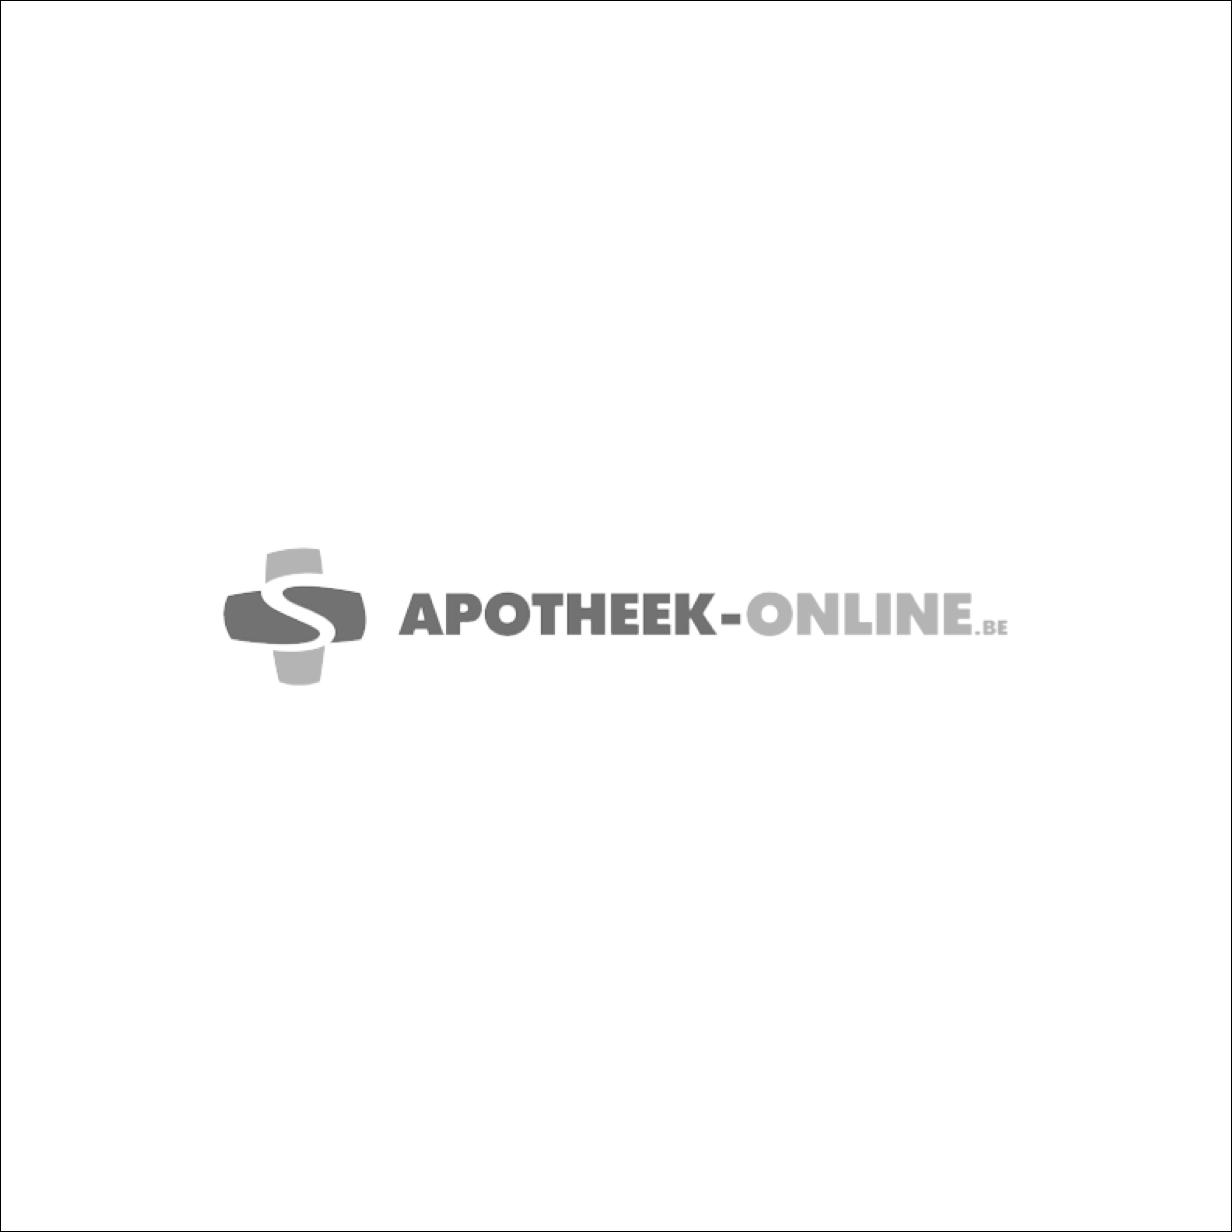 GAZIN CP N/STER 8P 7,5X 7,5CM 100 18503